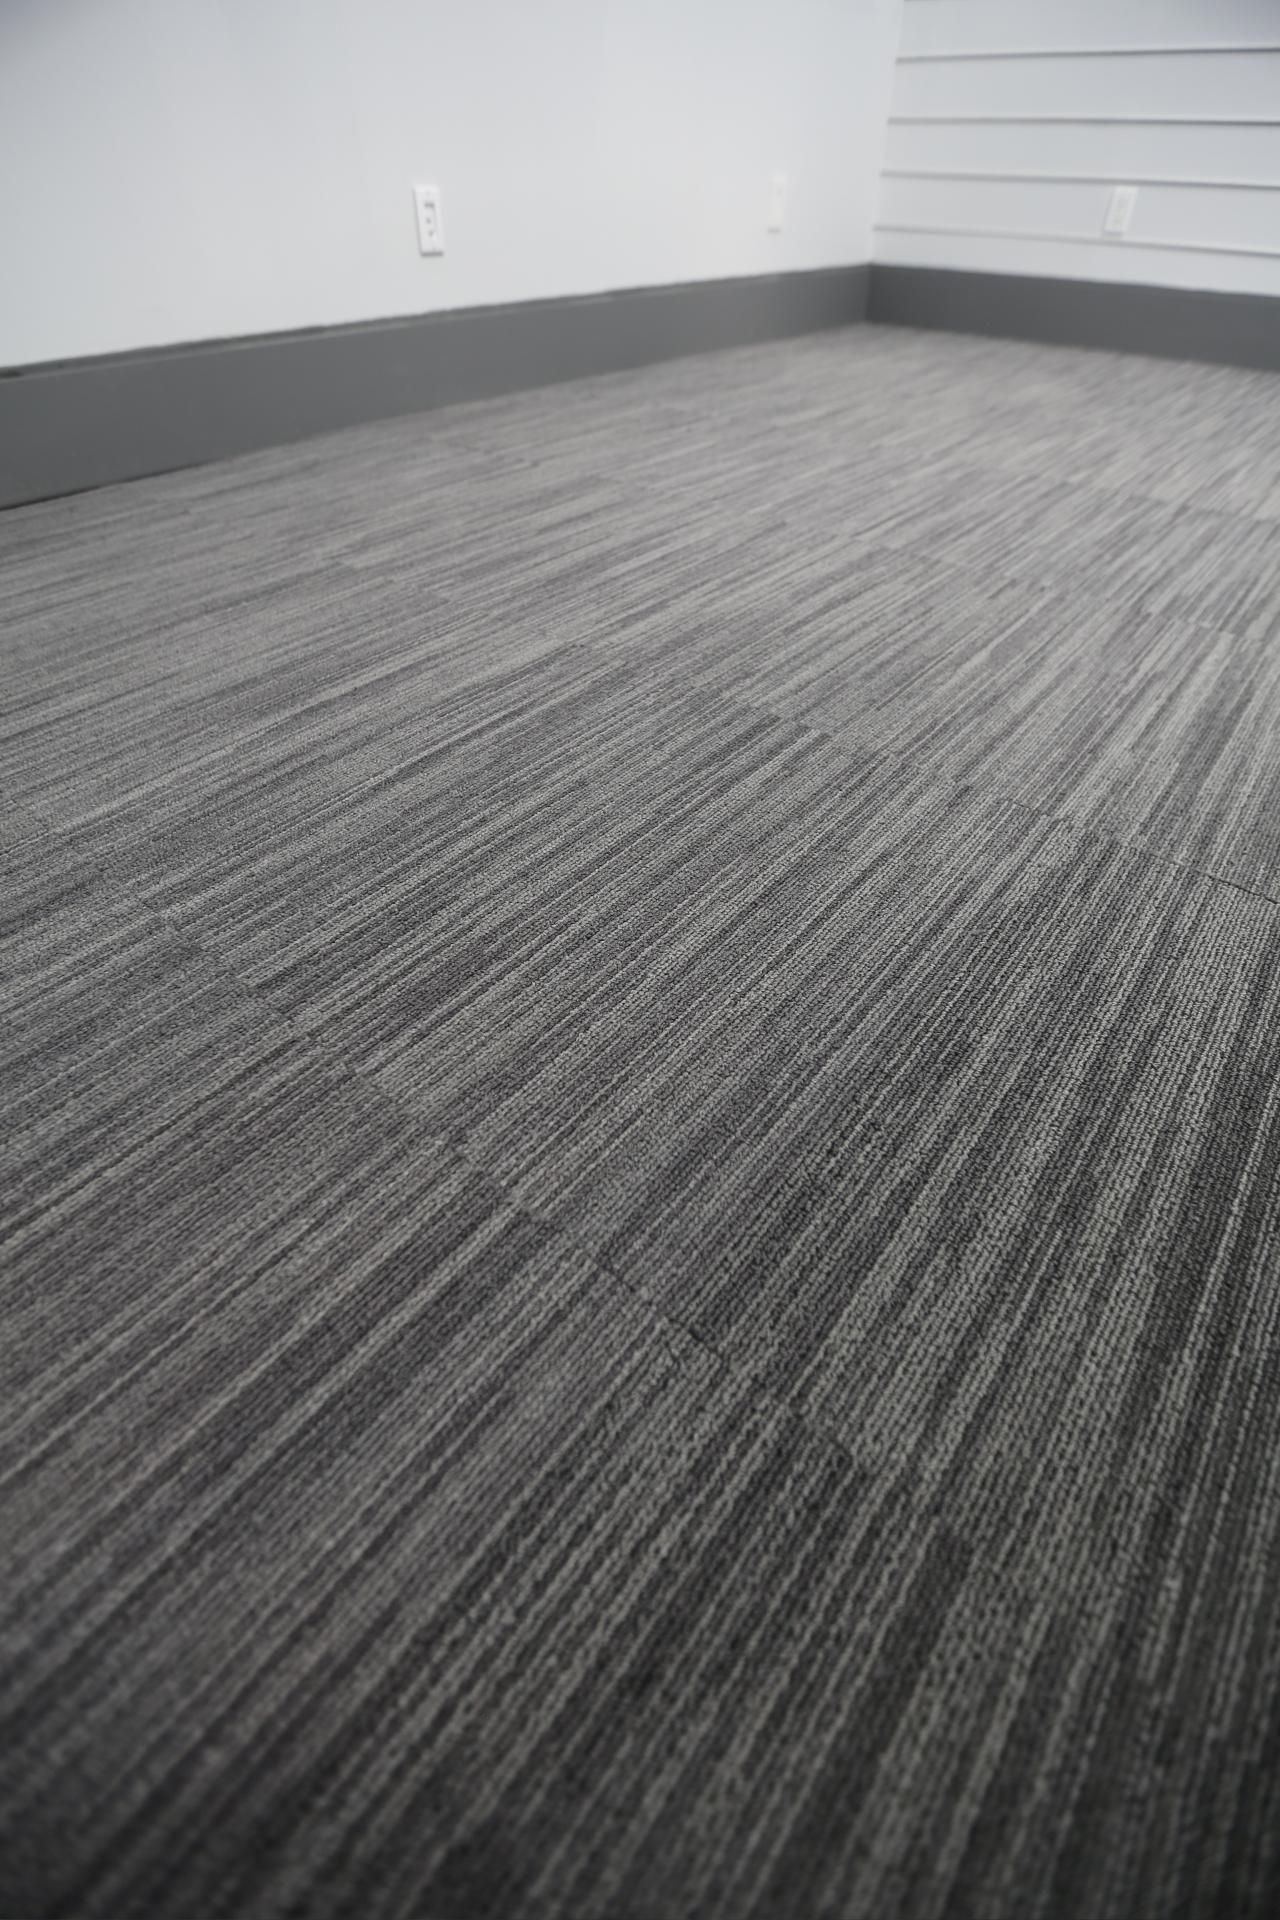 How To Install Carpet Tiles Over Vinyl Floor In 2020 Carpet Tiles Carpet Squares Carpet Installation